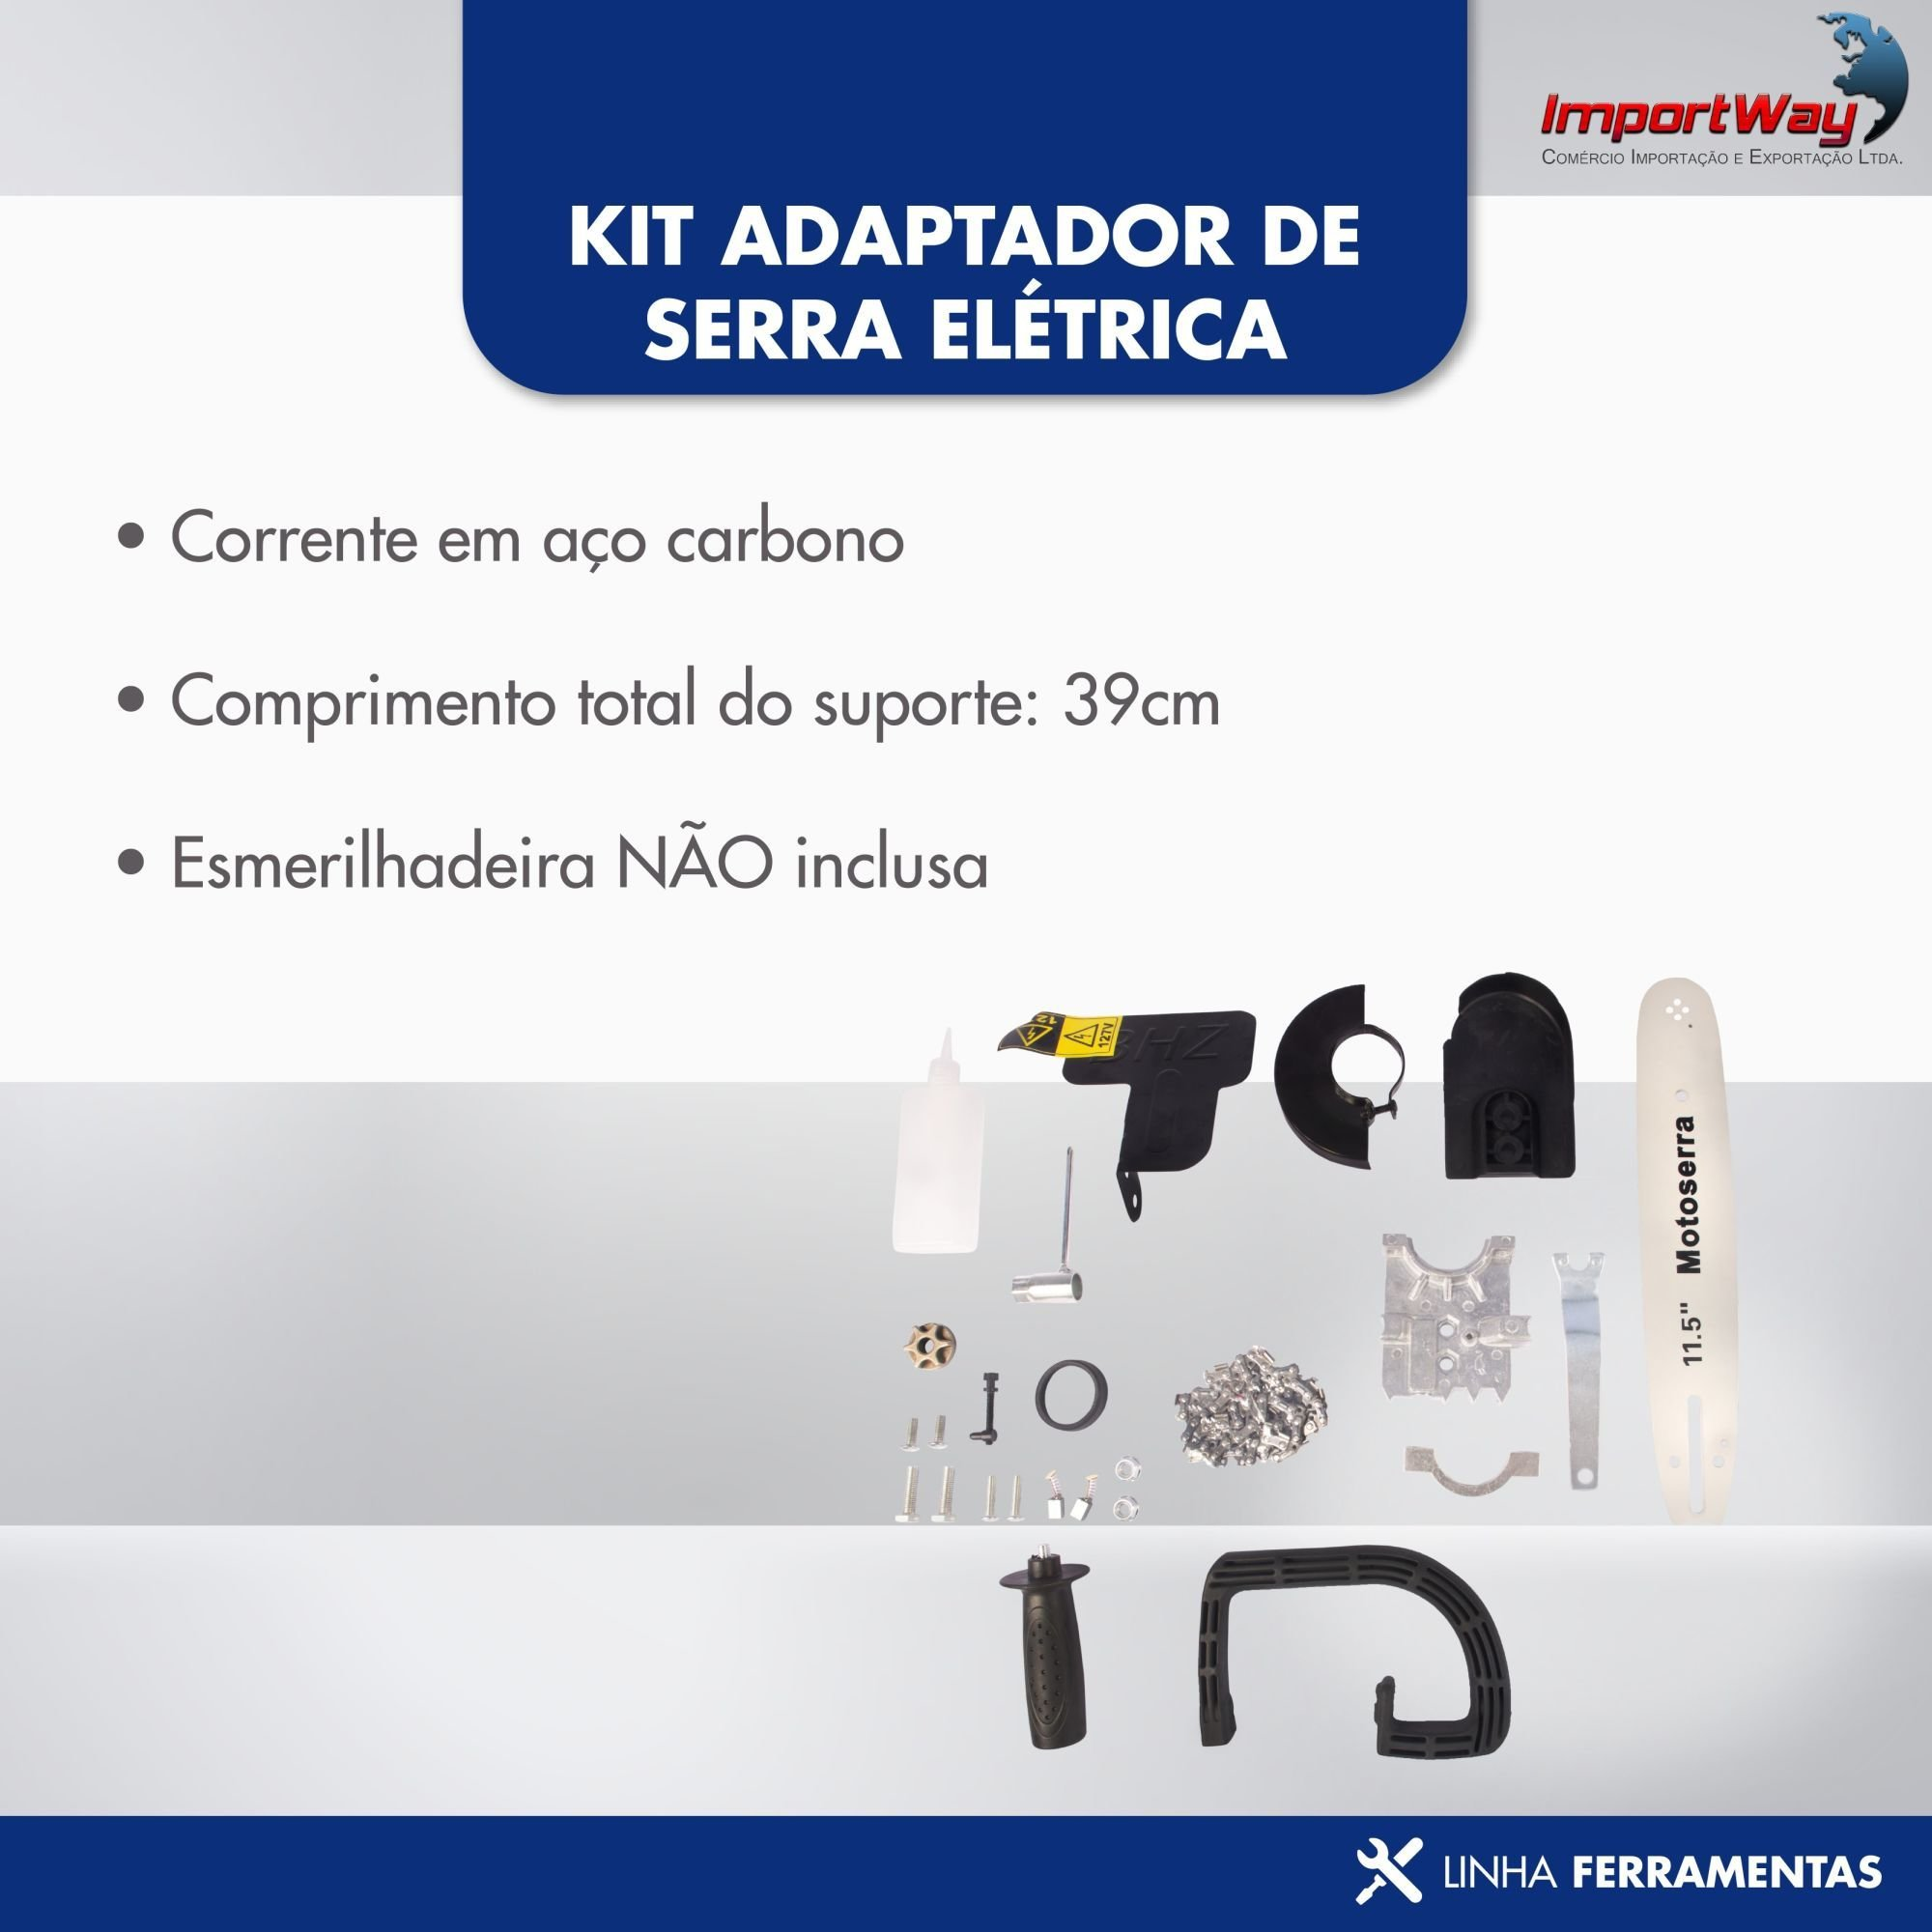 Kit Adaptador De Serra Elétrica Motosserra Universal - Importway